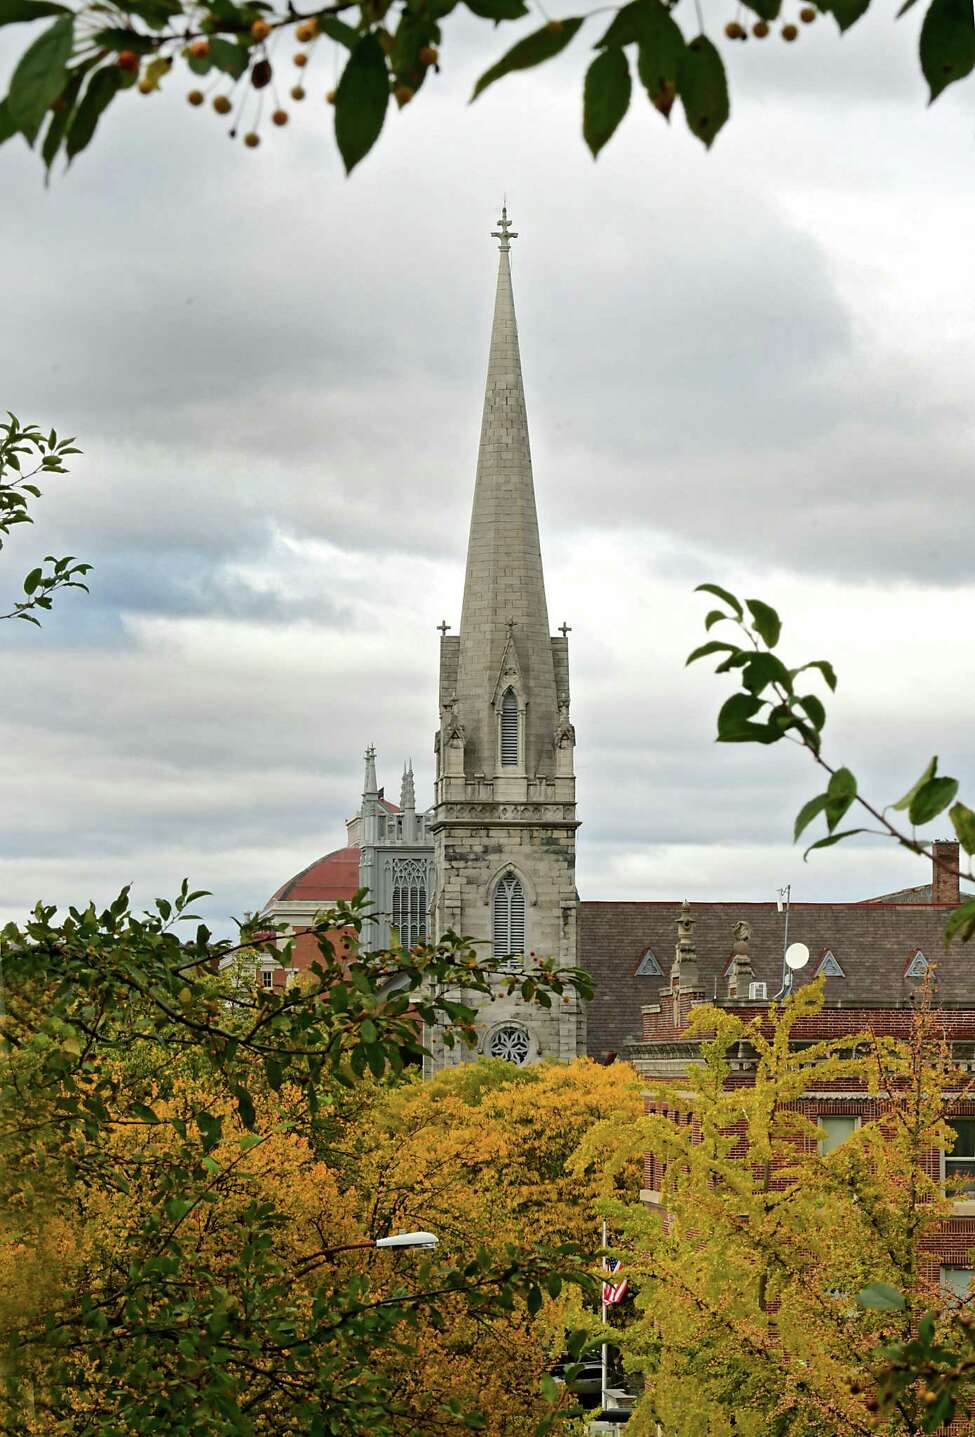 A church steeple rises above fall foliage on Friday, Oct. 18, 2019 in Troy, N.Y. (Lori Van Buren/Times Union)